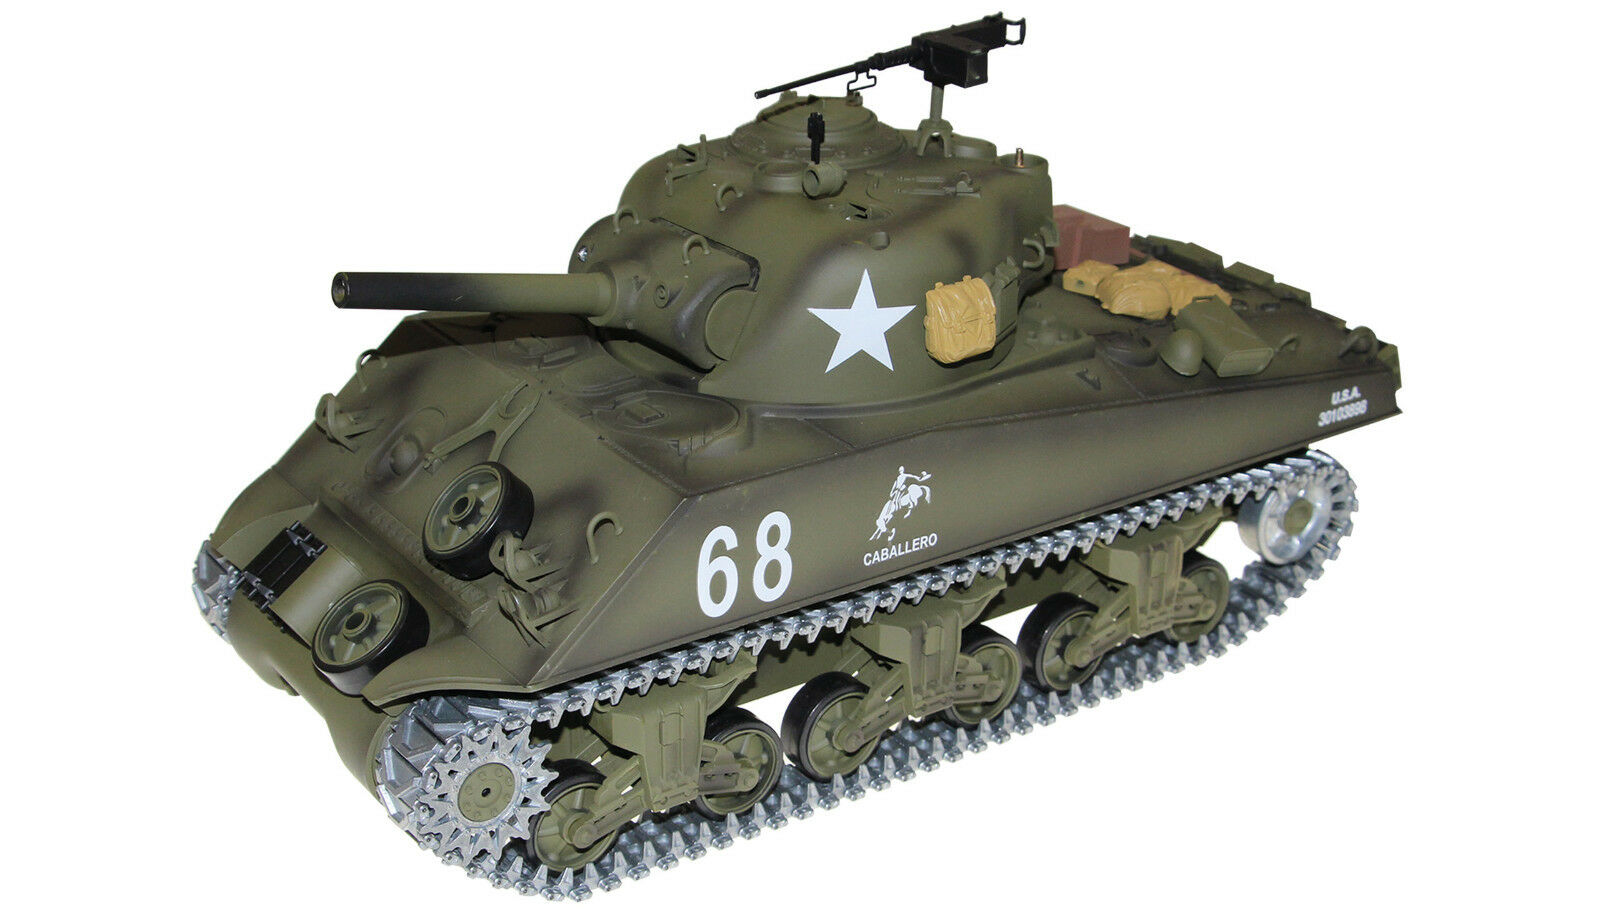 RC Militär Panzer U.S.M4A3 SHERMAN R&S/2.4GHZ Metallketten/Metallgetriebe/QC